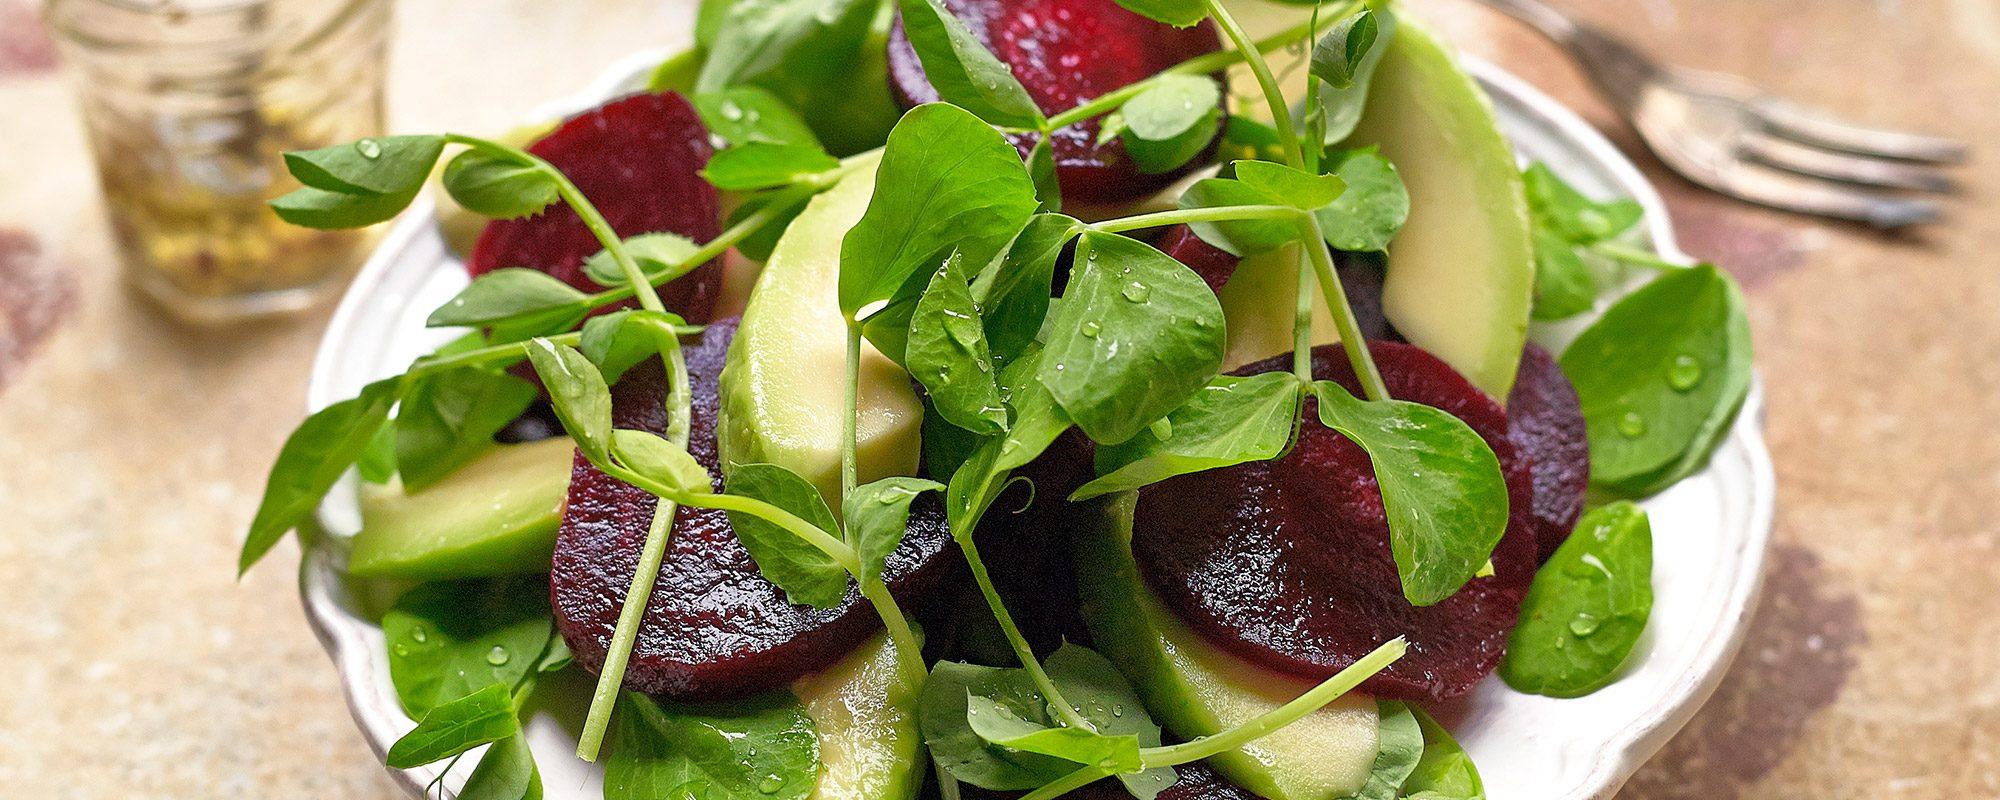 Beetroot, Avocado and Pea Shoots Salad